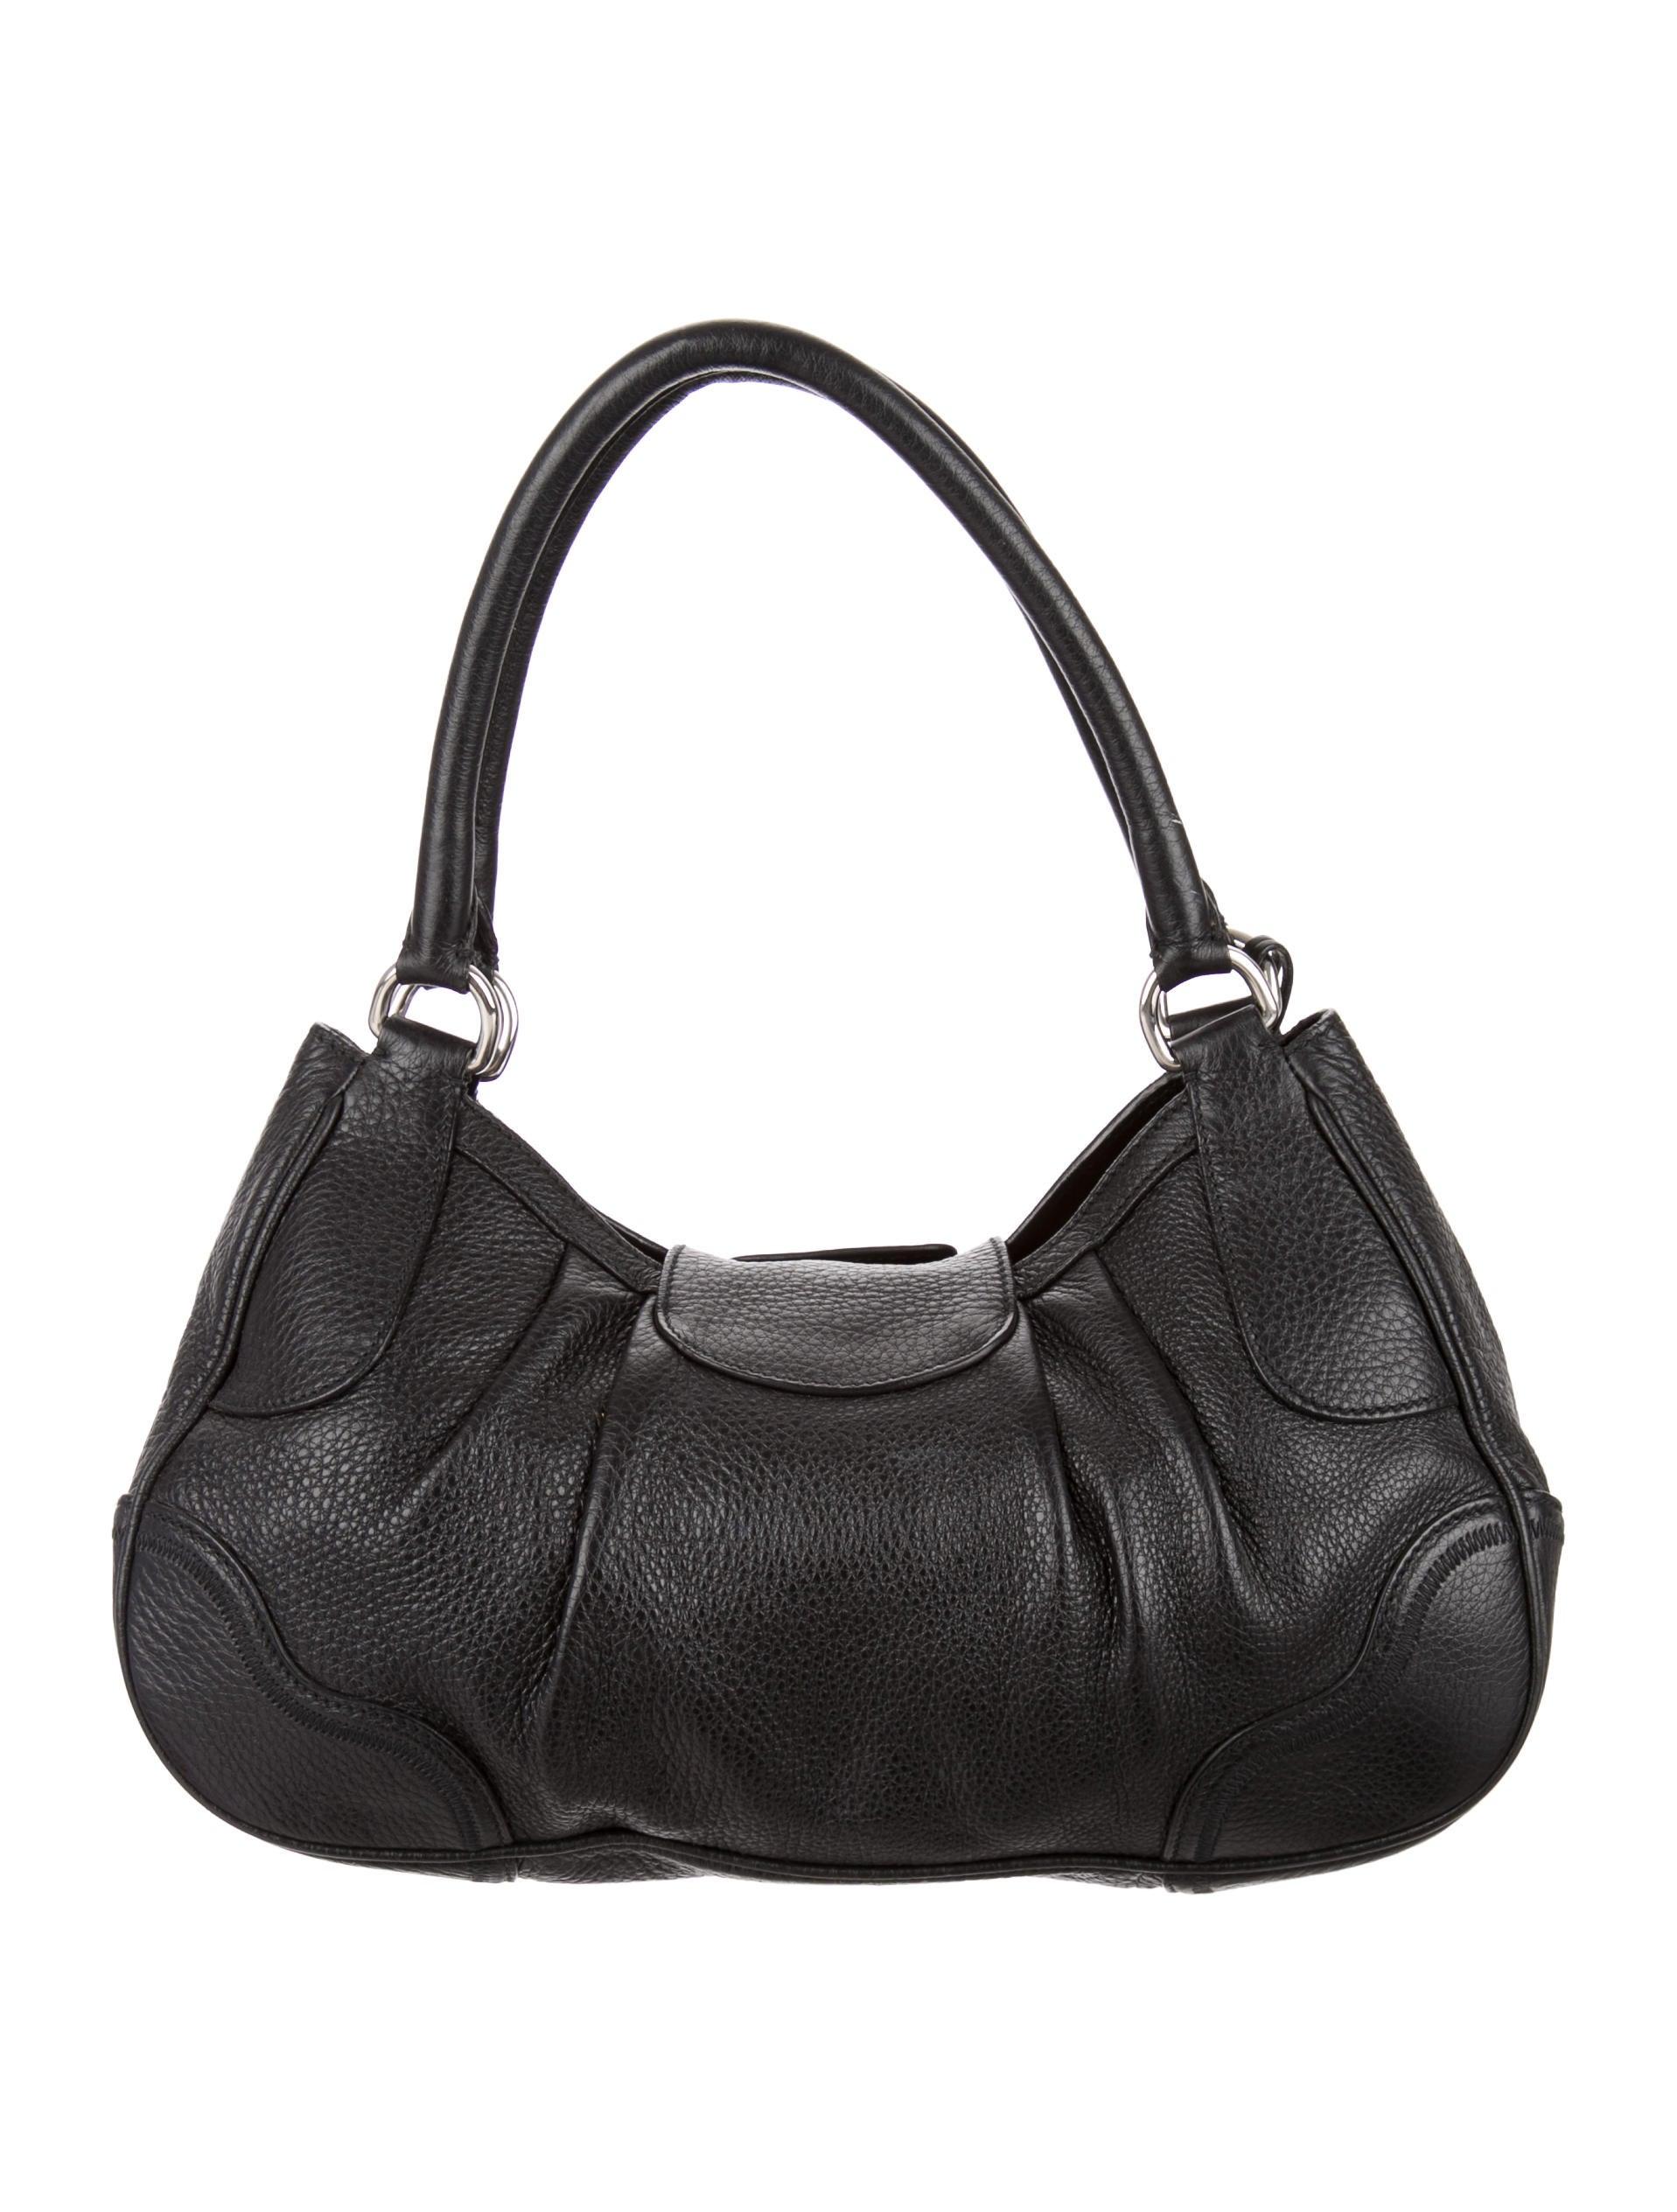 Prada Pebbled Leather Hobo - Handbags - PRA85564 | The RealReal